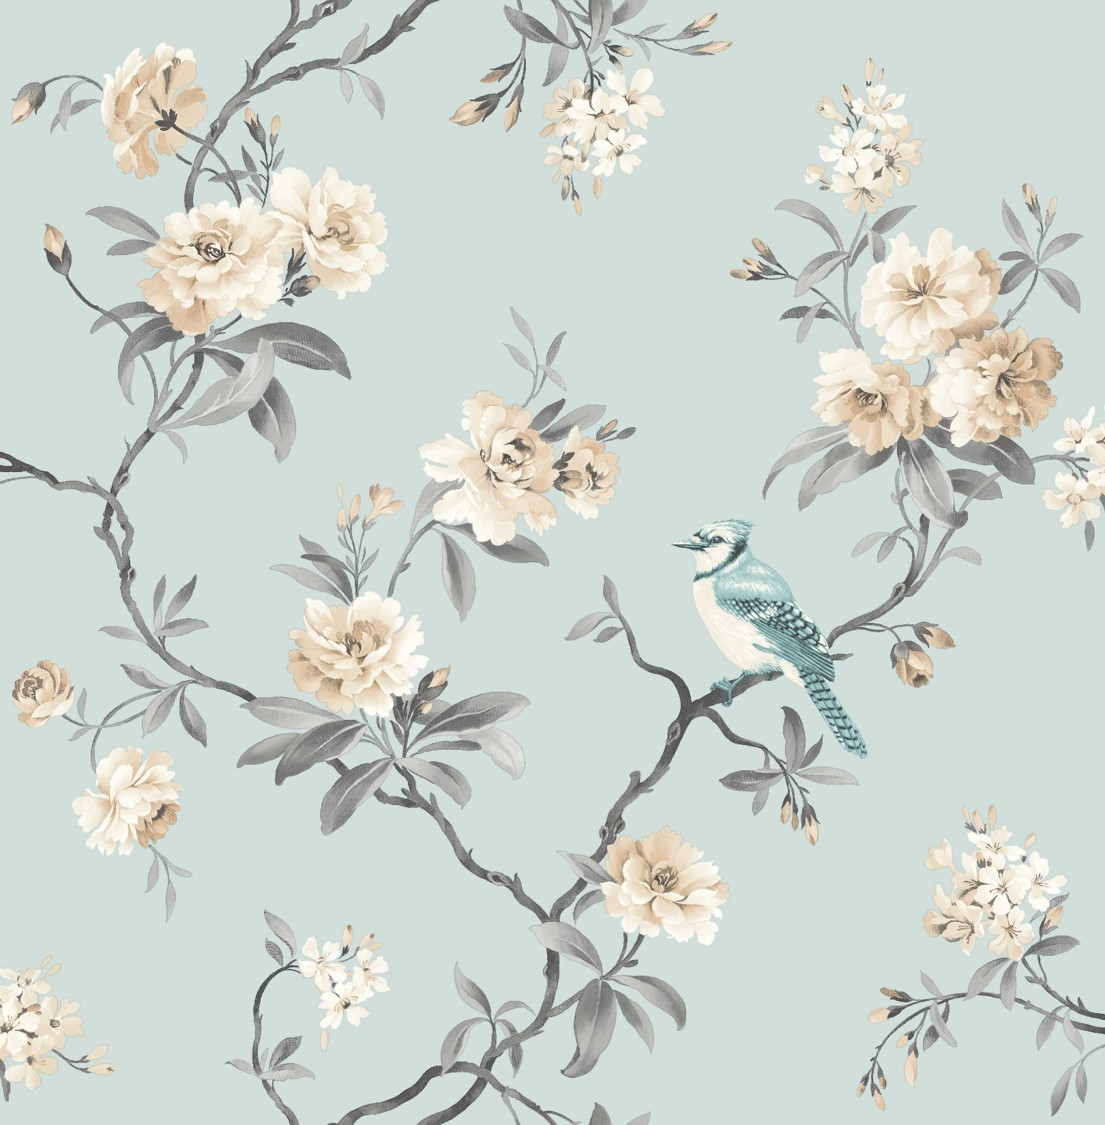 Decor Chinoiserie Wallpaper   FD40765   Teal   Cut Price Wallpaper 1105x1125